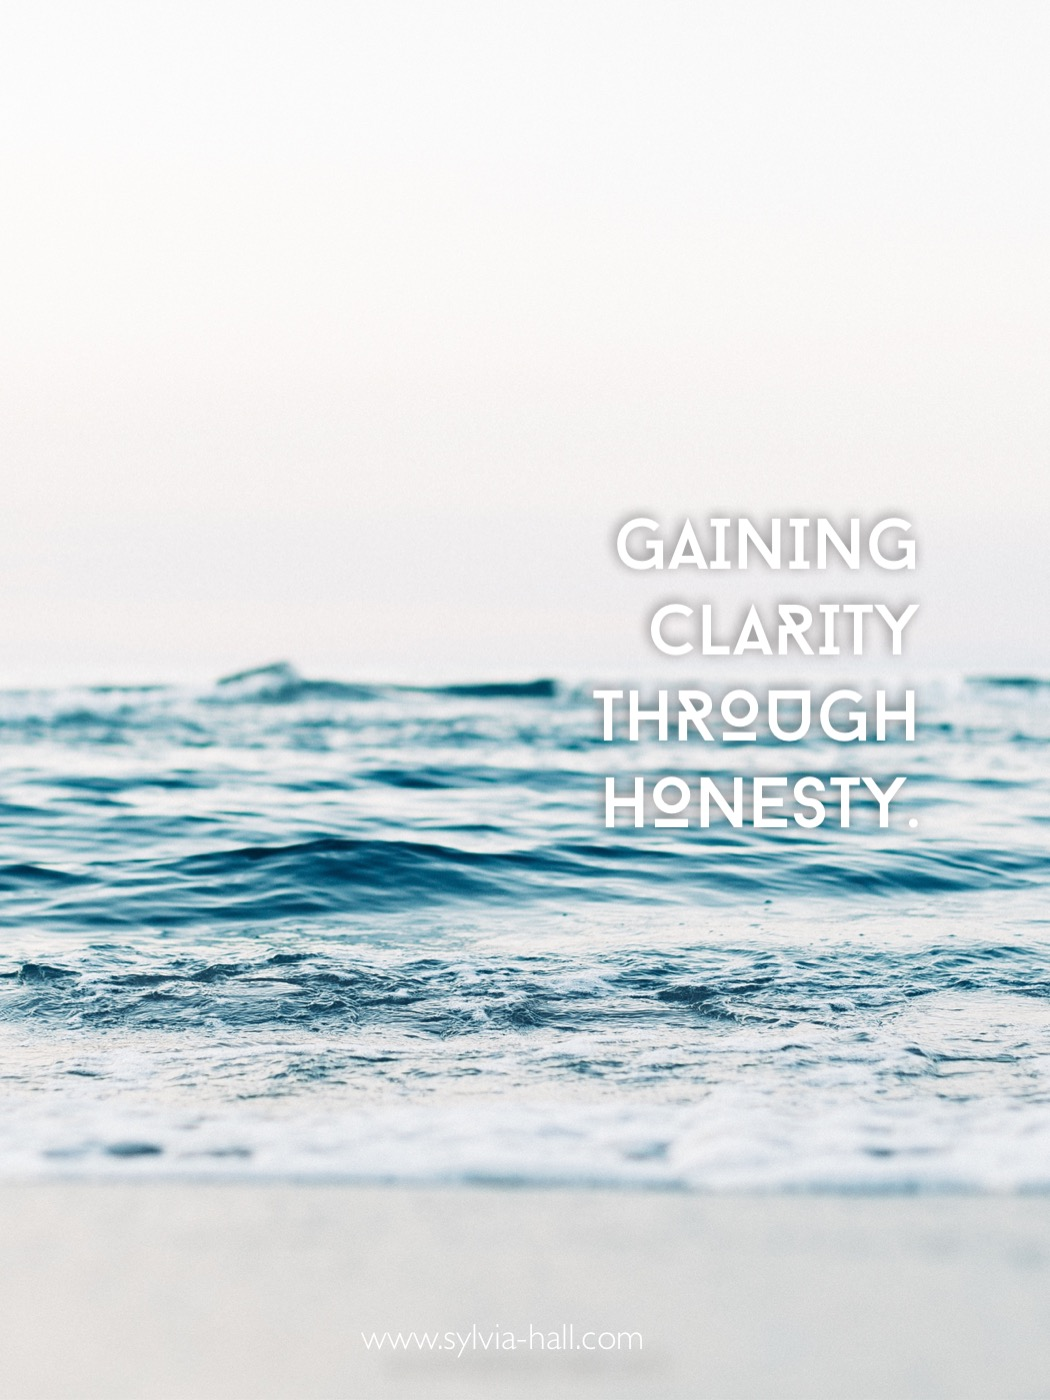 Gaining Clarity Through Honesty